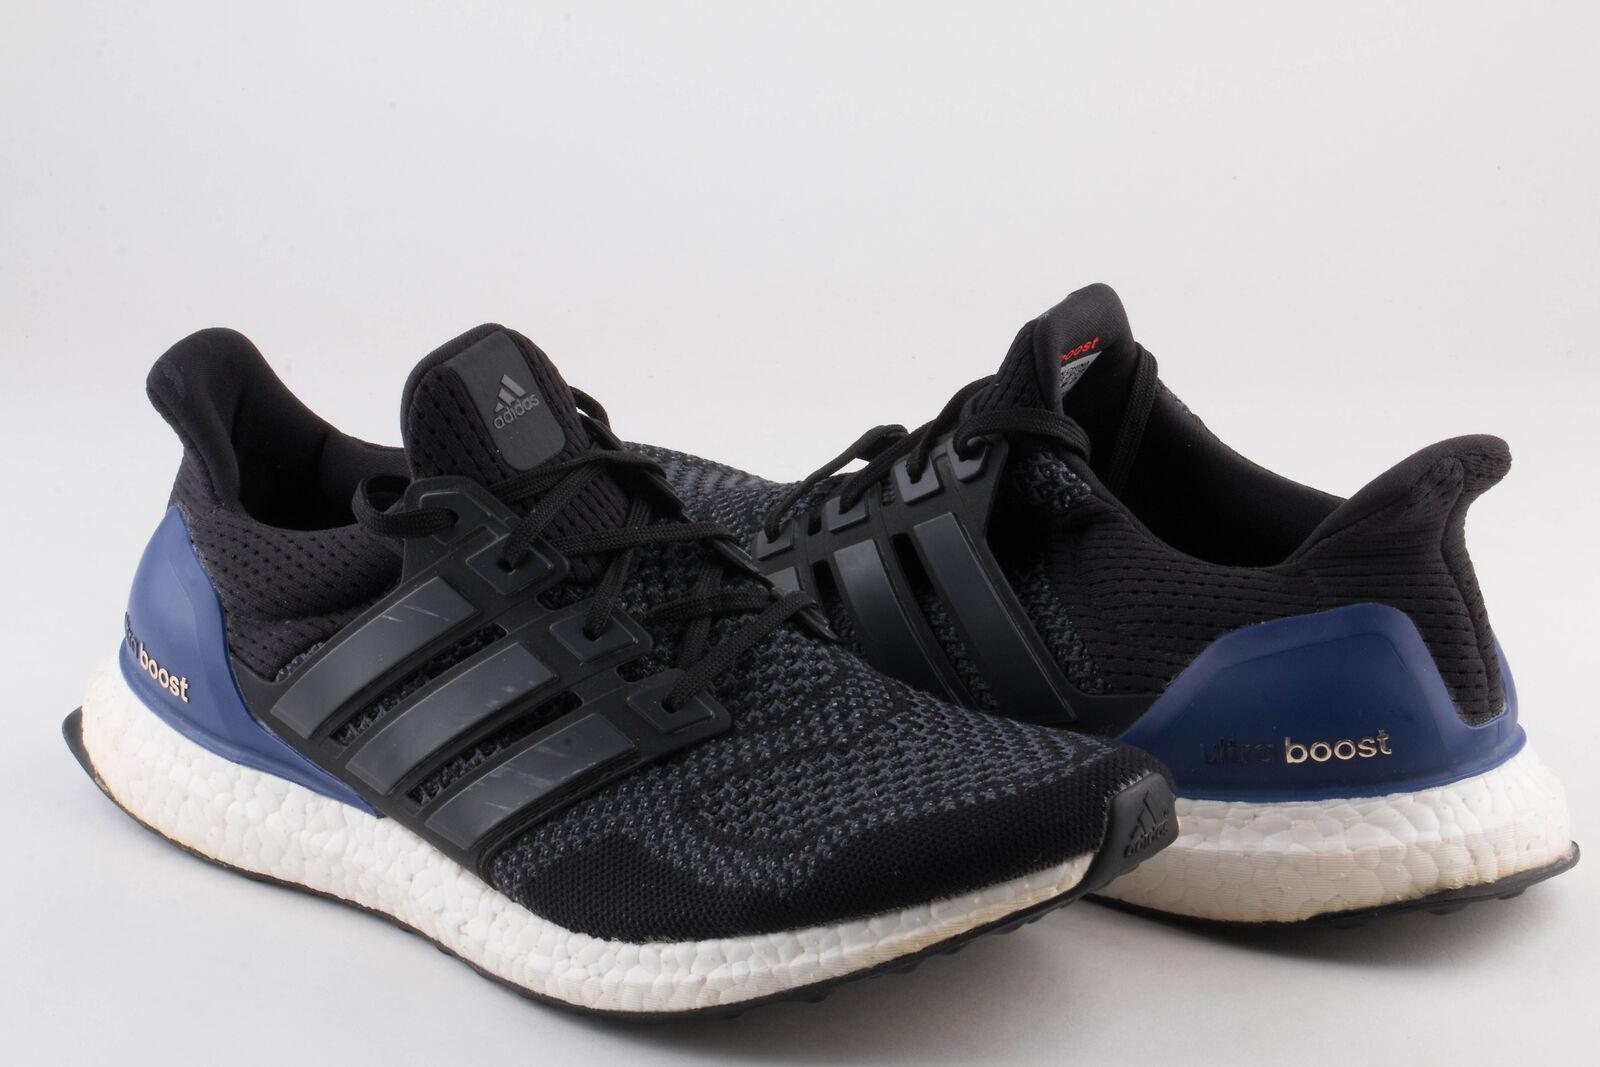 Adidas M Para Hombre Ultra Boost M Adidas og 1St Ultra Boost Negro/Púrpura B27171 Sz10.5 Seminuevo e1efe4